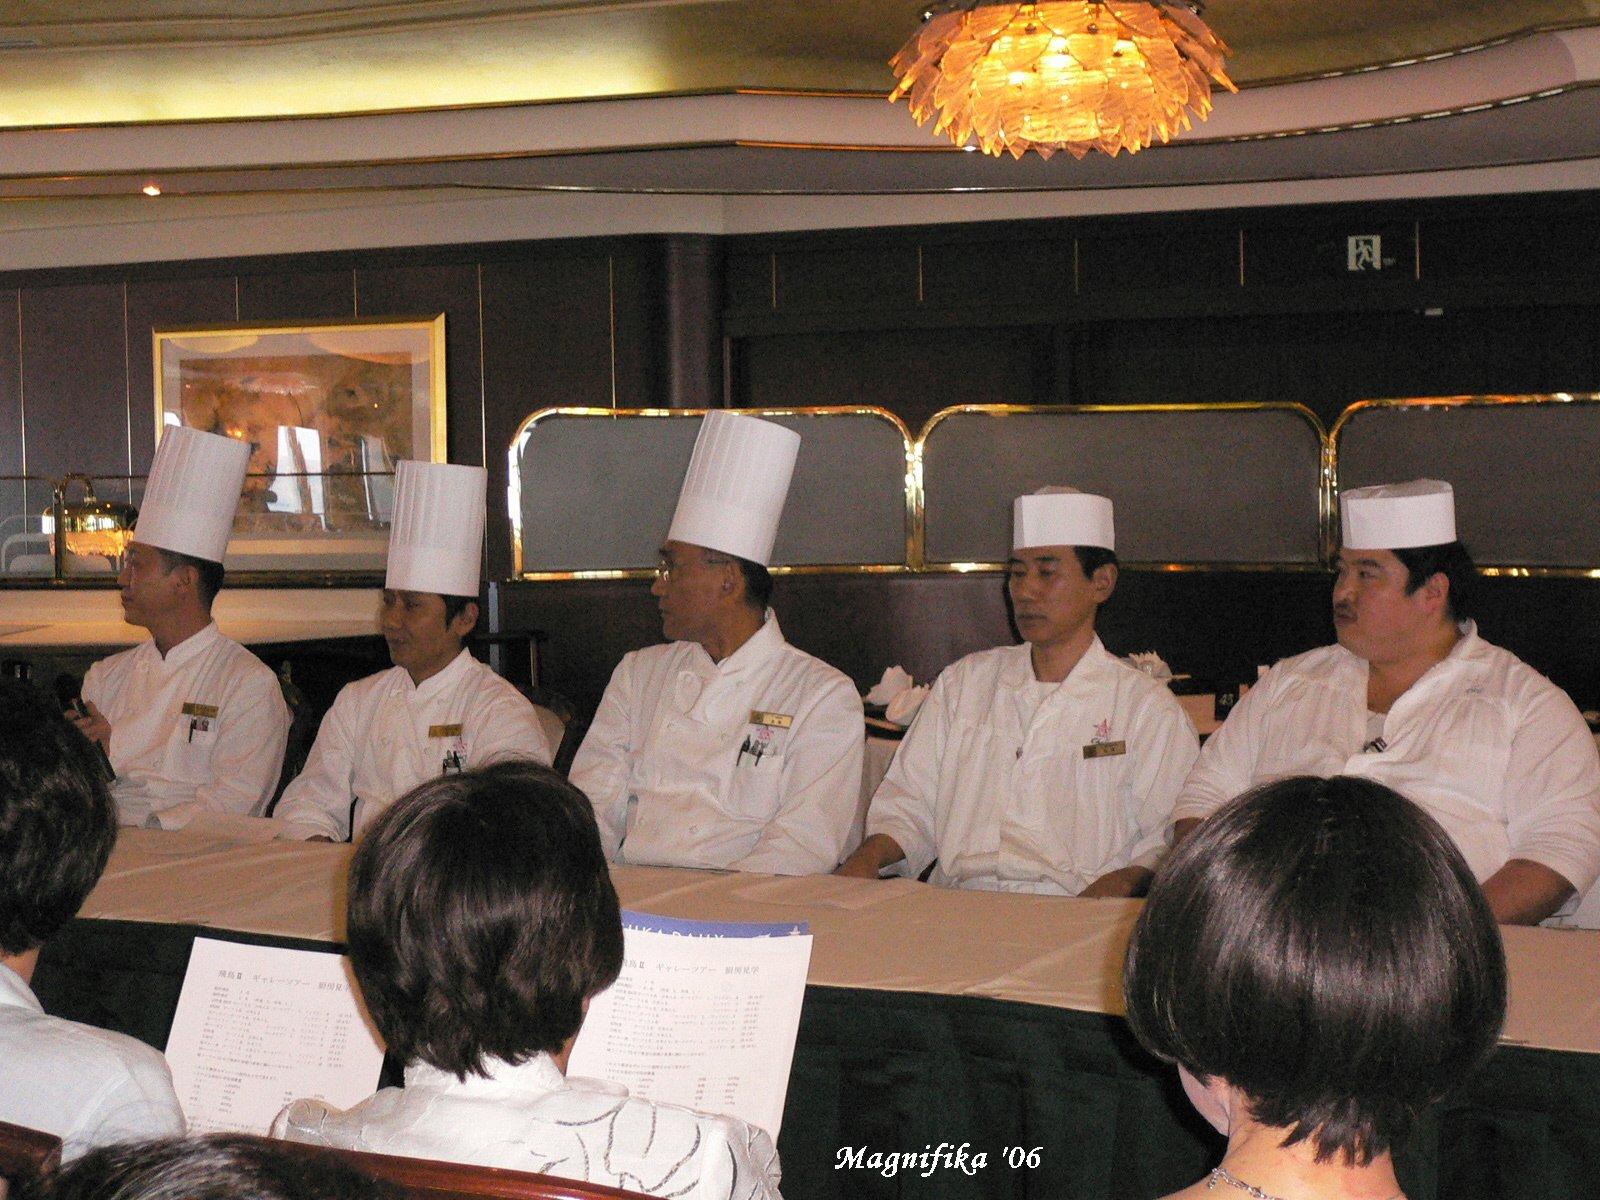 ASUKA II world cruise 2006 No.75 galley tour / 厨房見学_e0140365_1762856.jpg